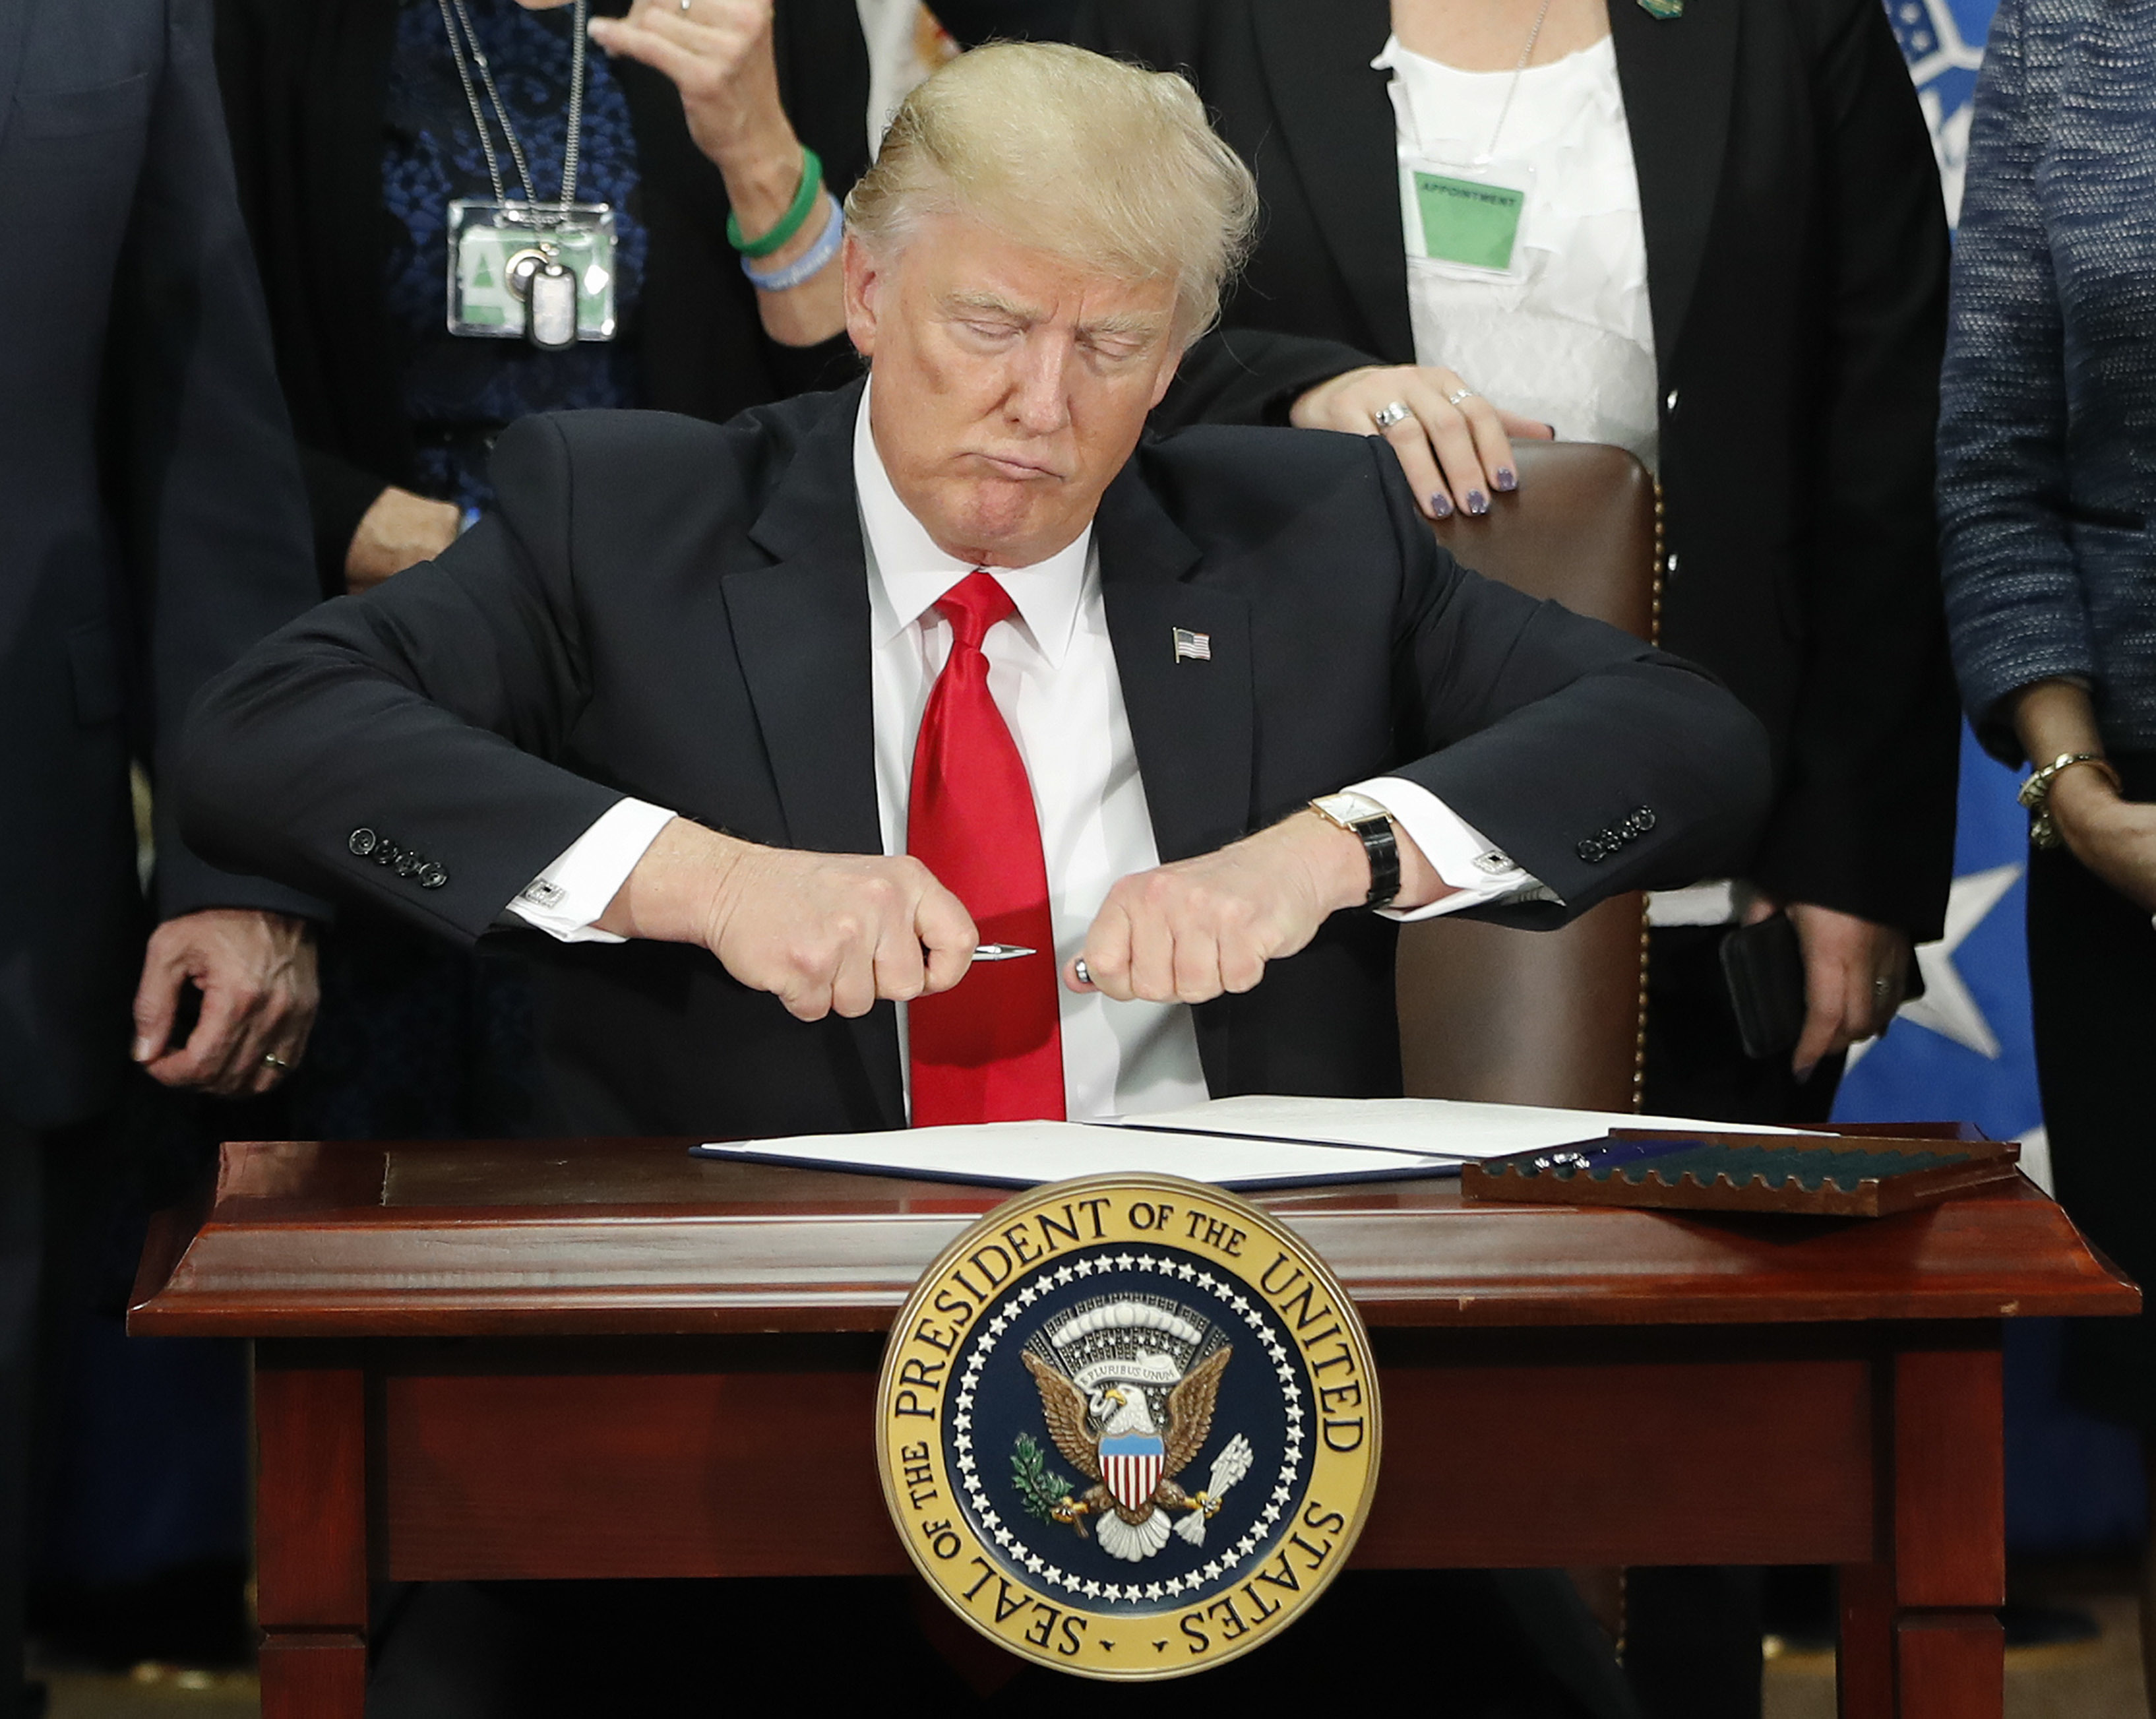 Donald Trump, zákaz, moslimovia, Irán, utečenci